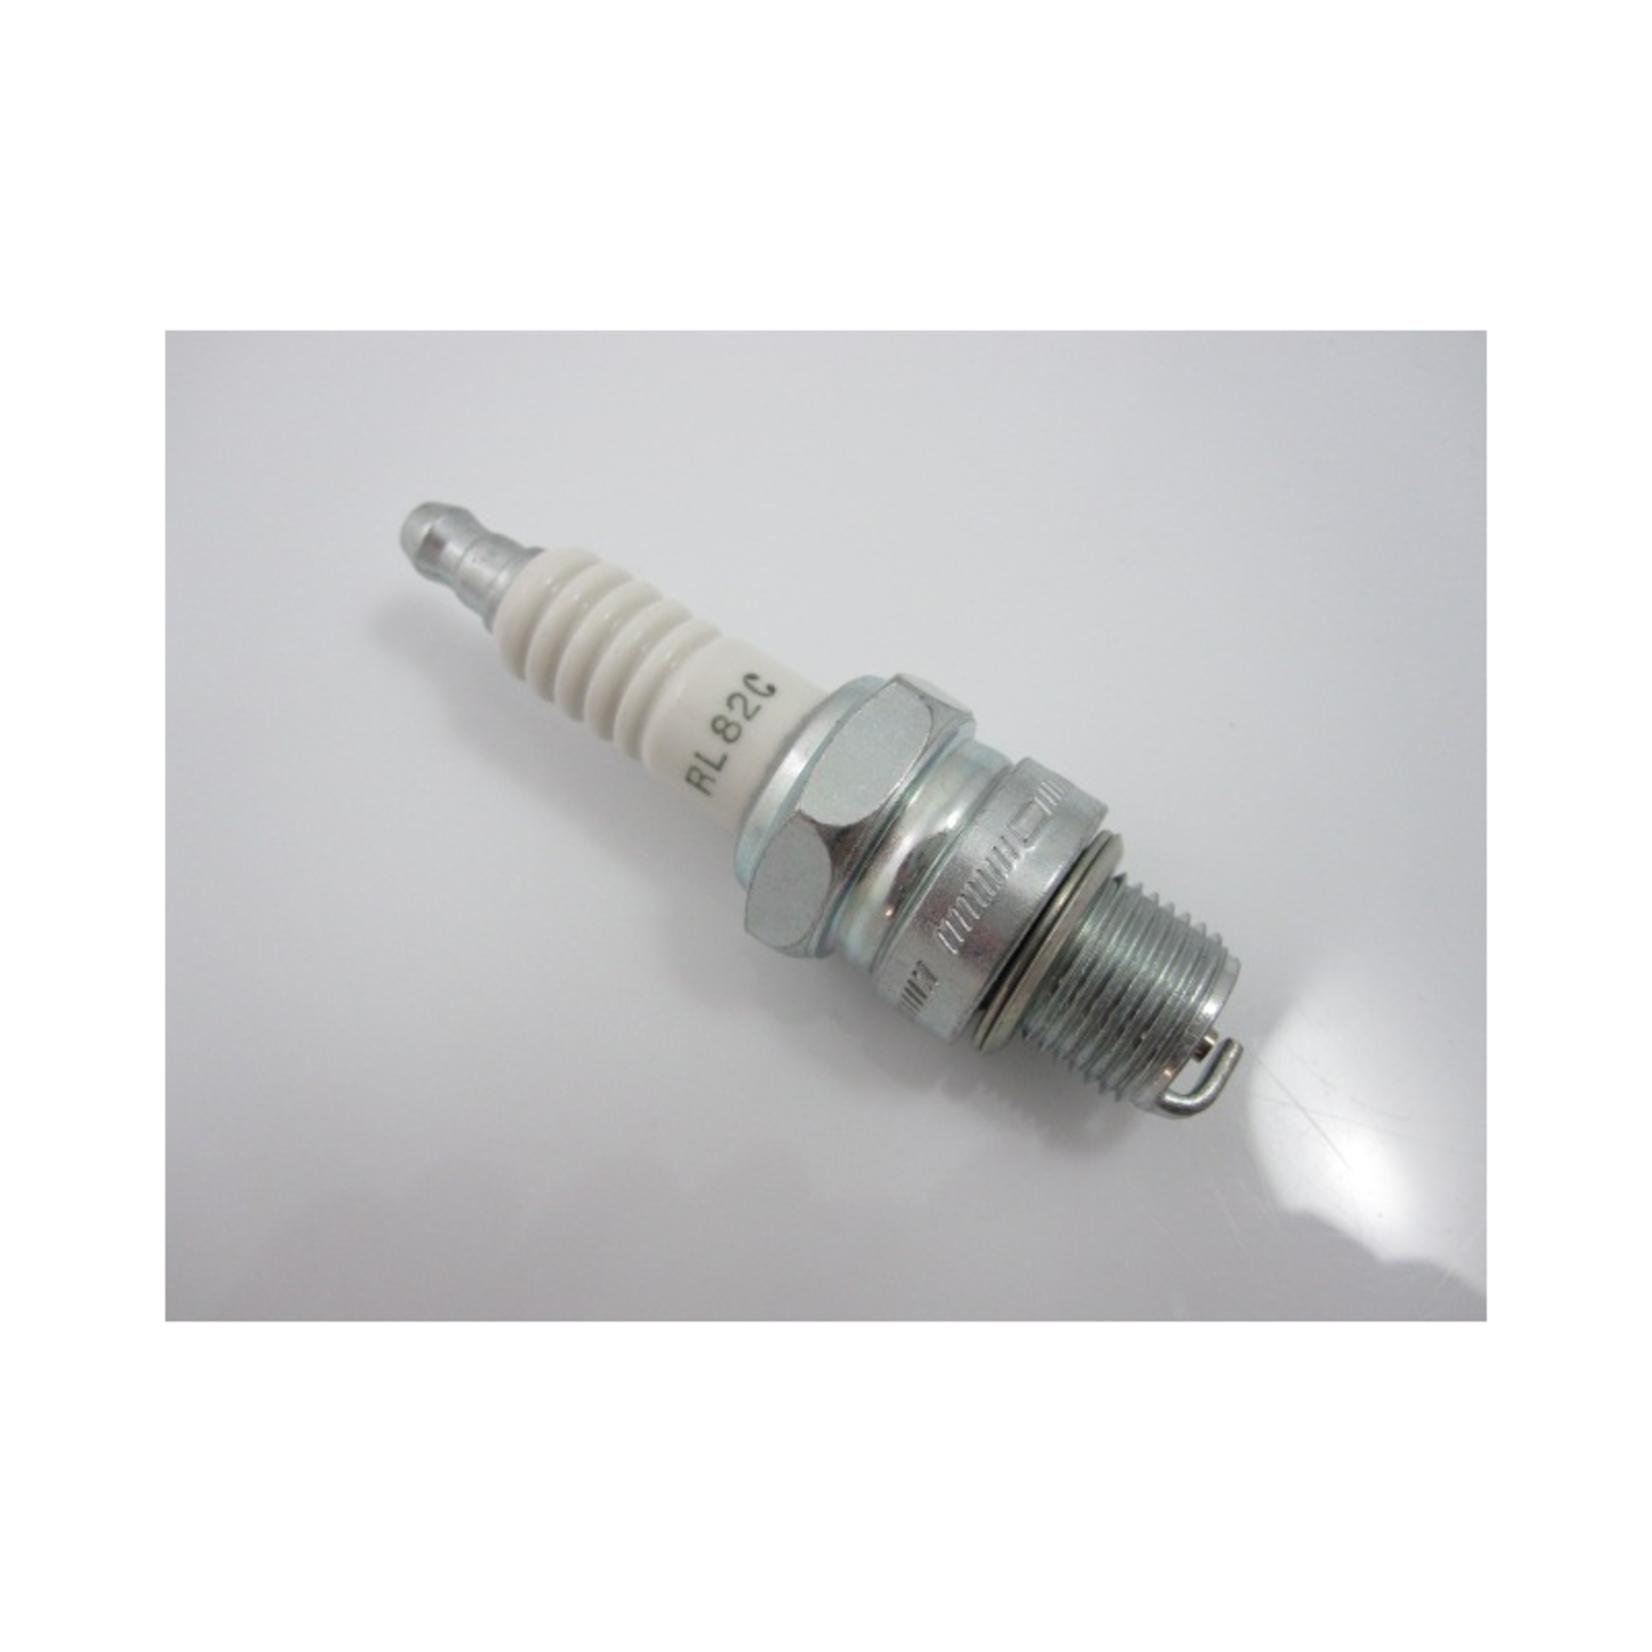 Parts Spark Plug, RL82C Champion PX125/150 Modern